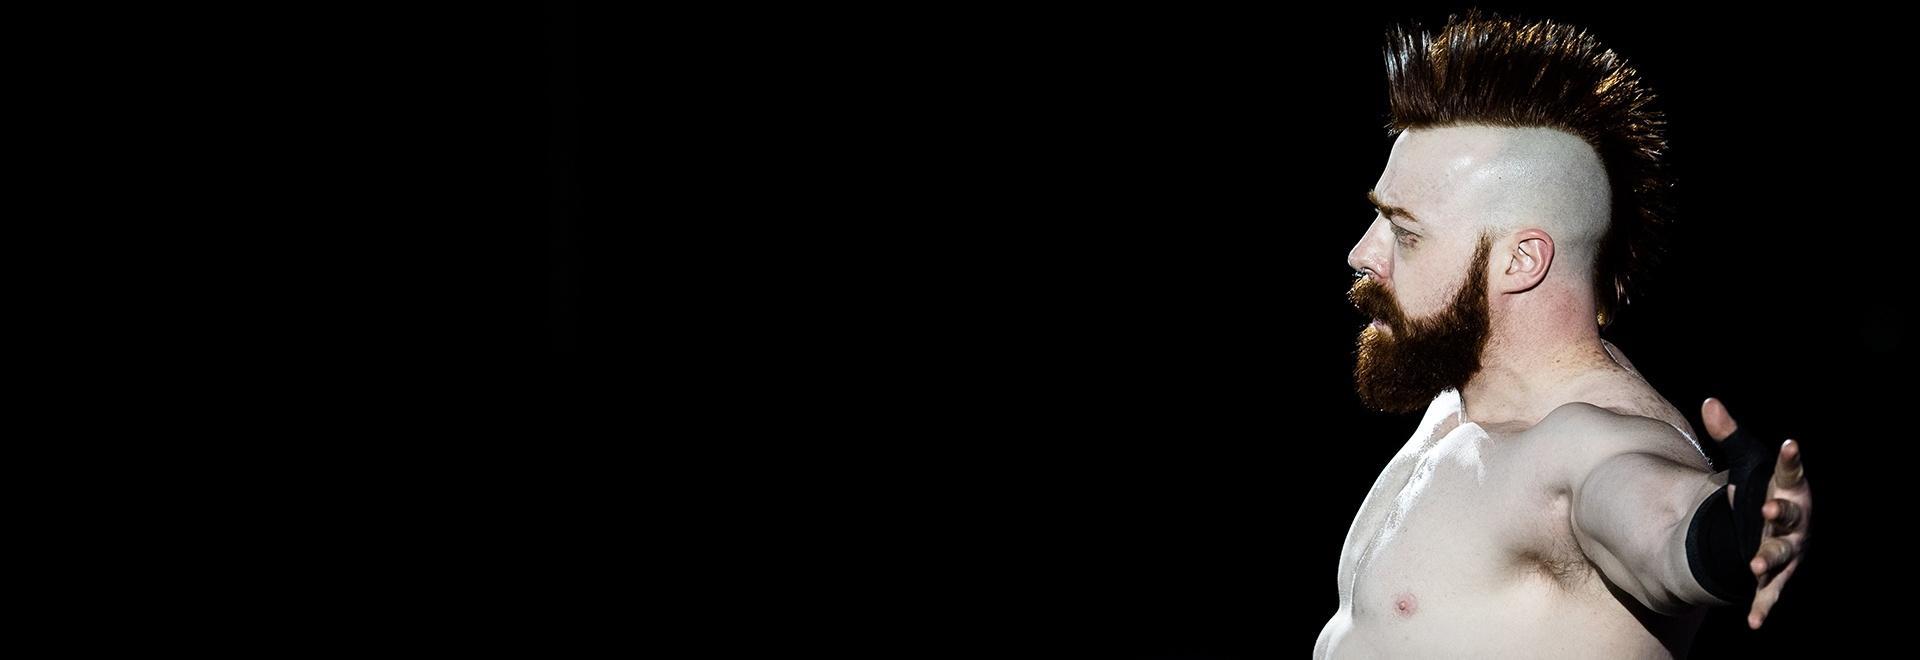 Ep. 47